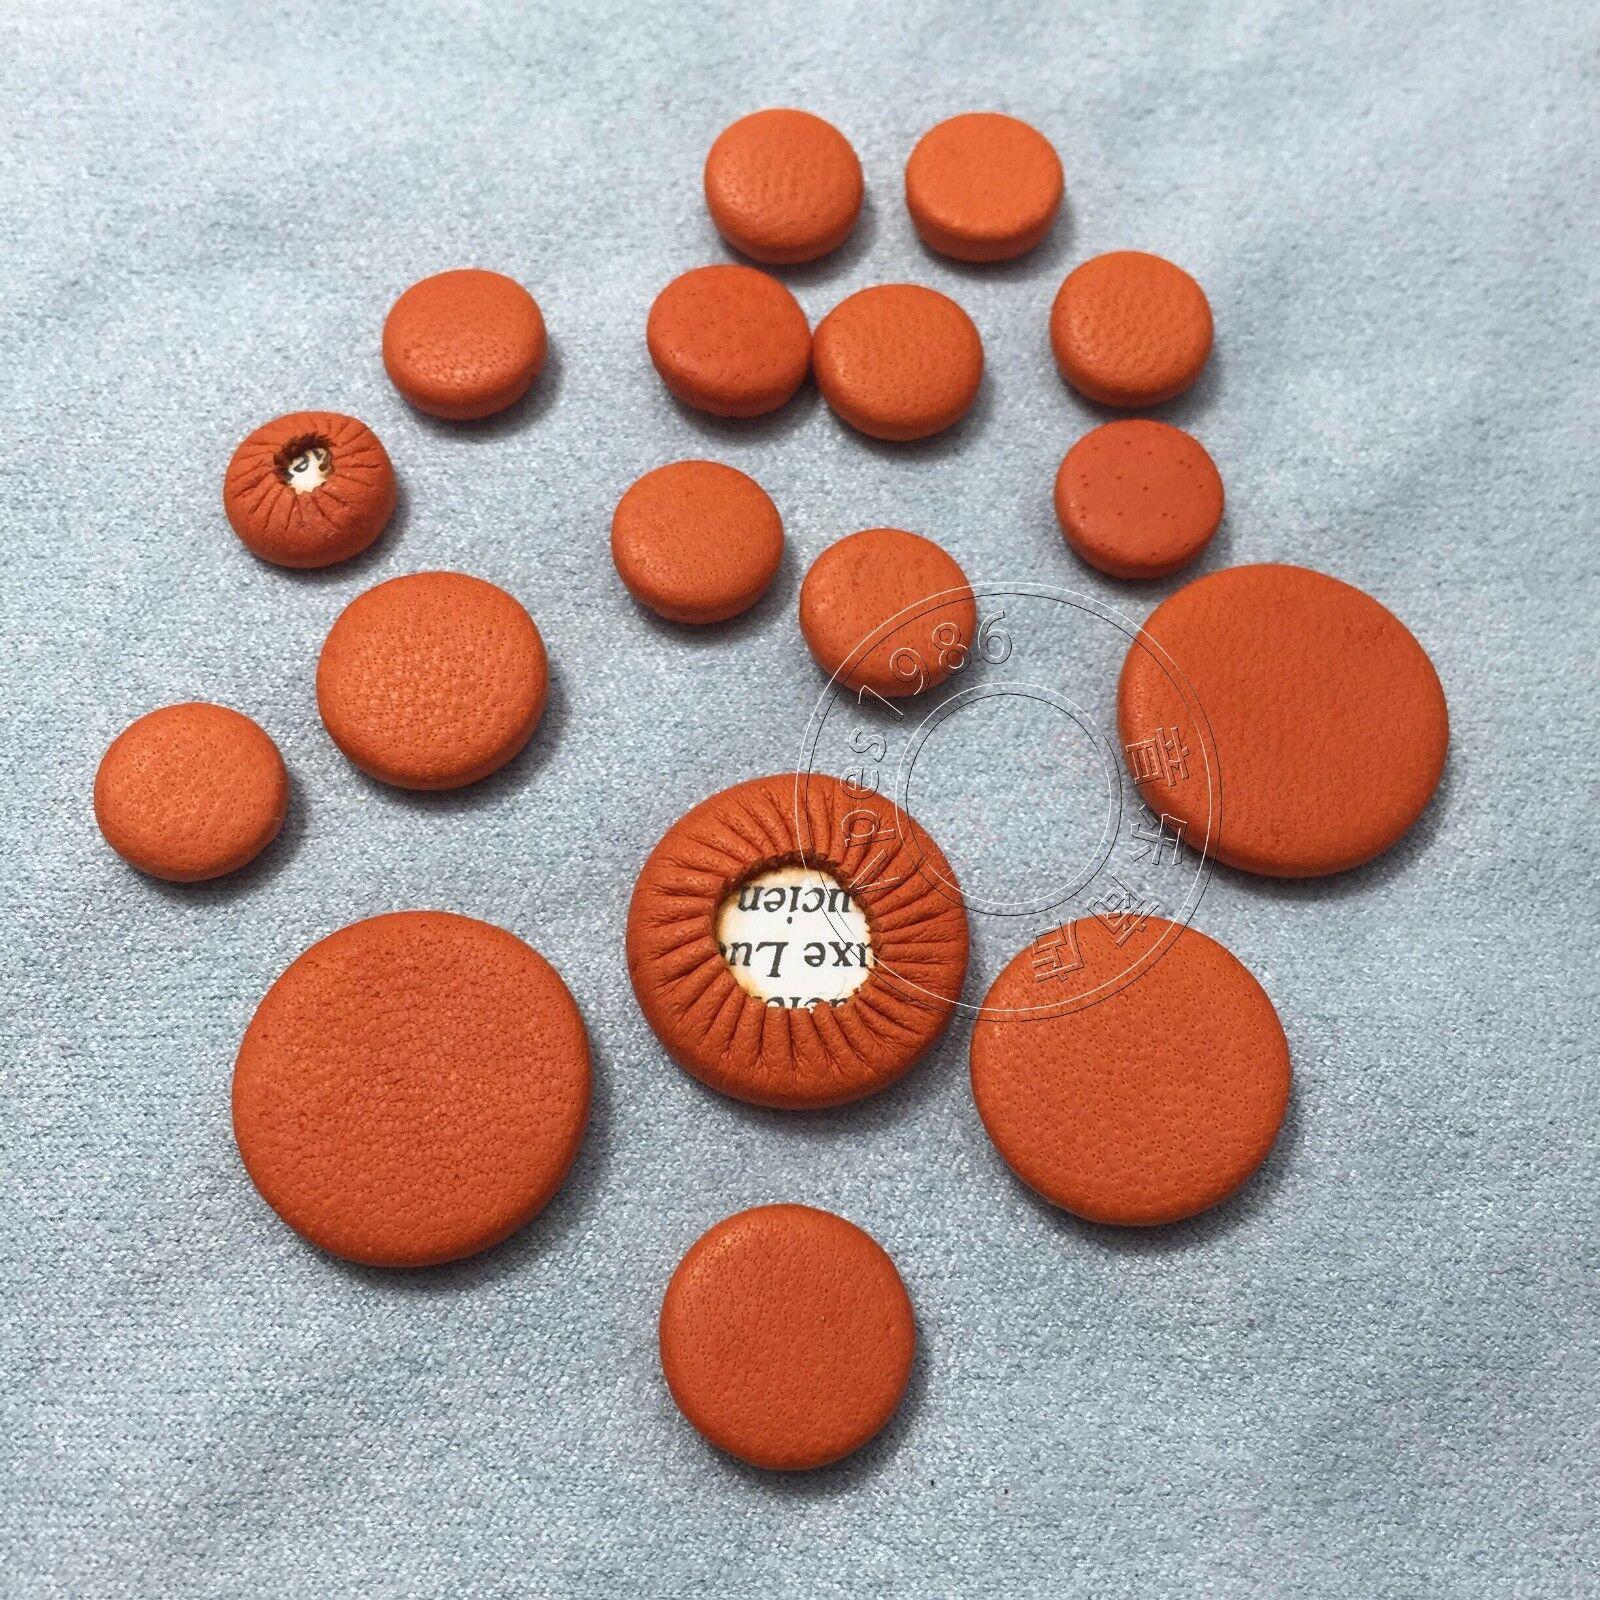 200 PC Ausgezeichnete Klarinette Leder tolles Material Orange Farbe